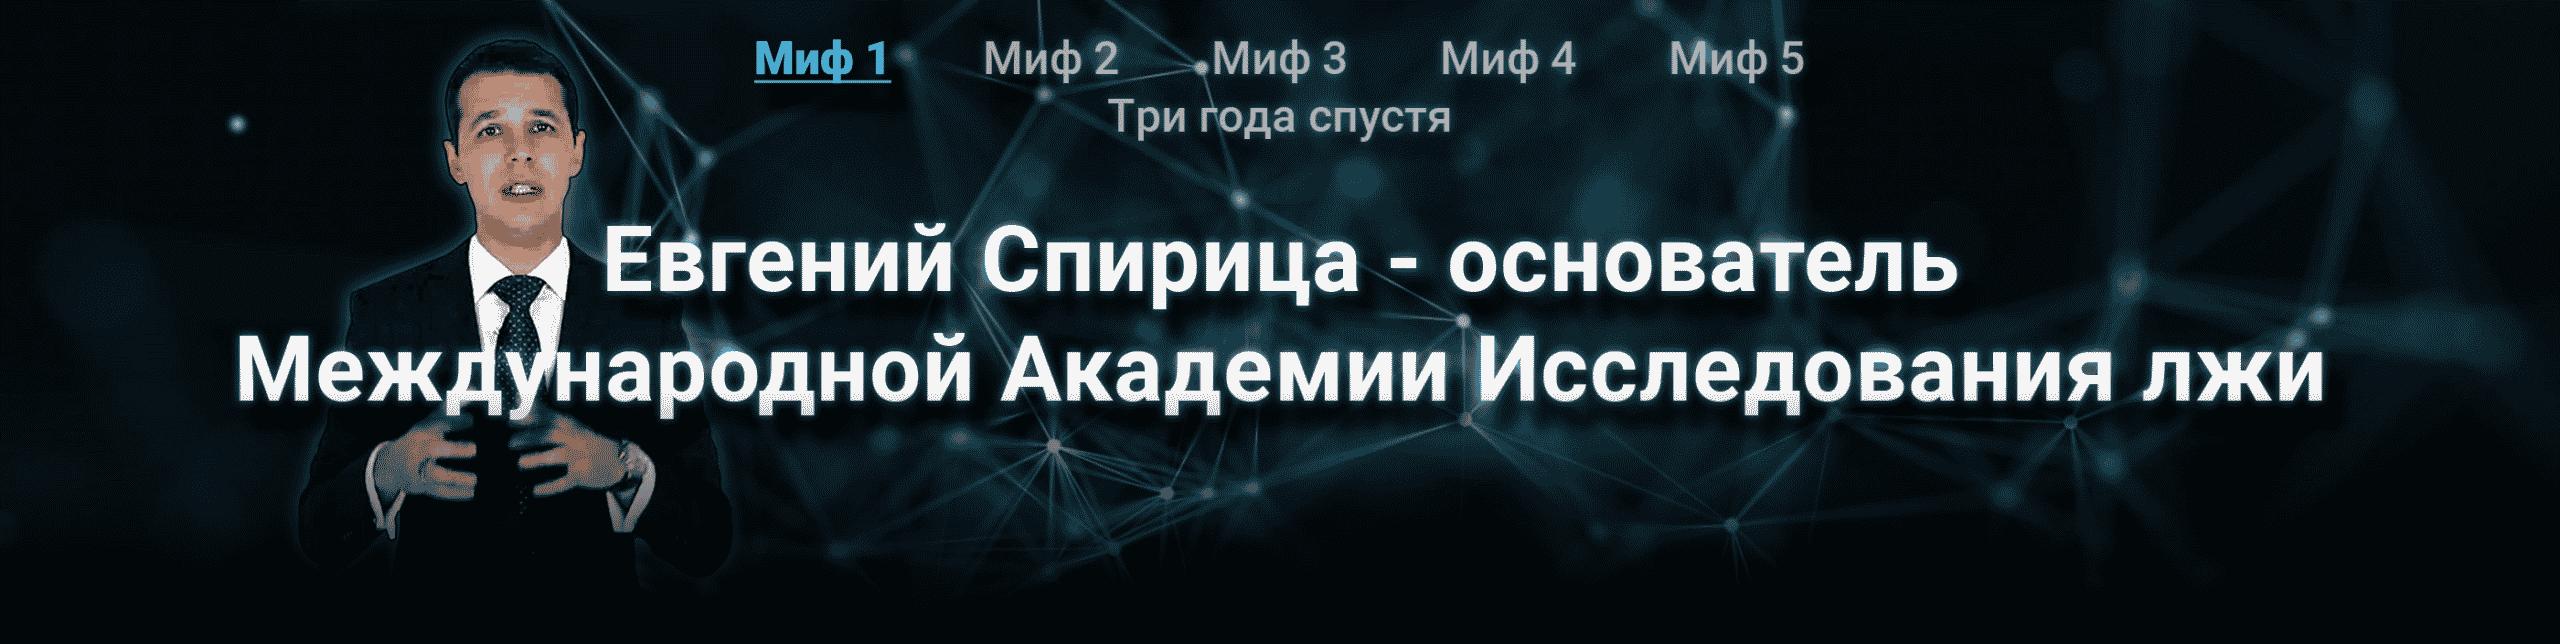 Евгений Спирица; Международная Академия Исследования Лжи; ICDS Group; Миф #1: Евгений Спирица — основатель Международной Академии Исследования лжи